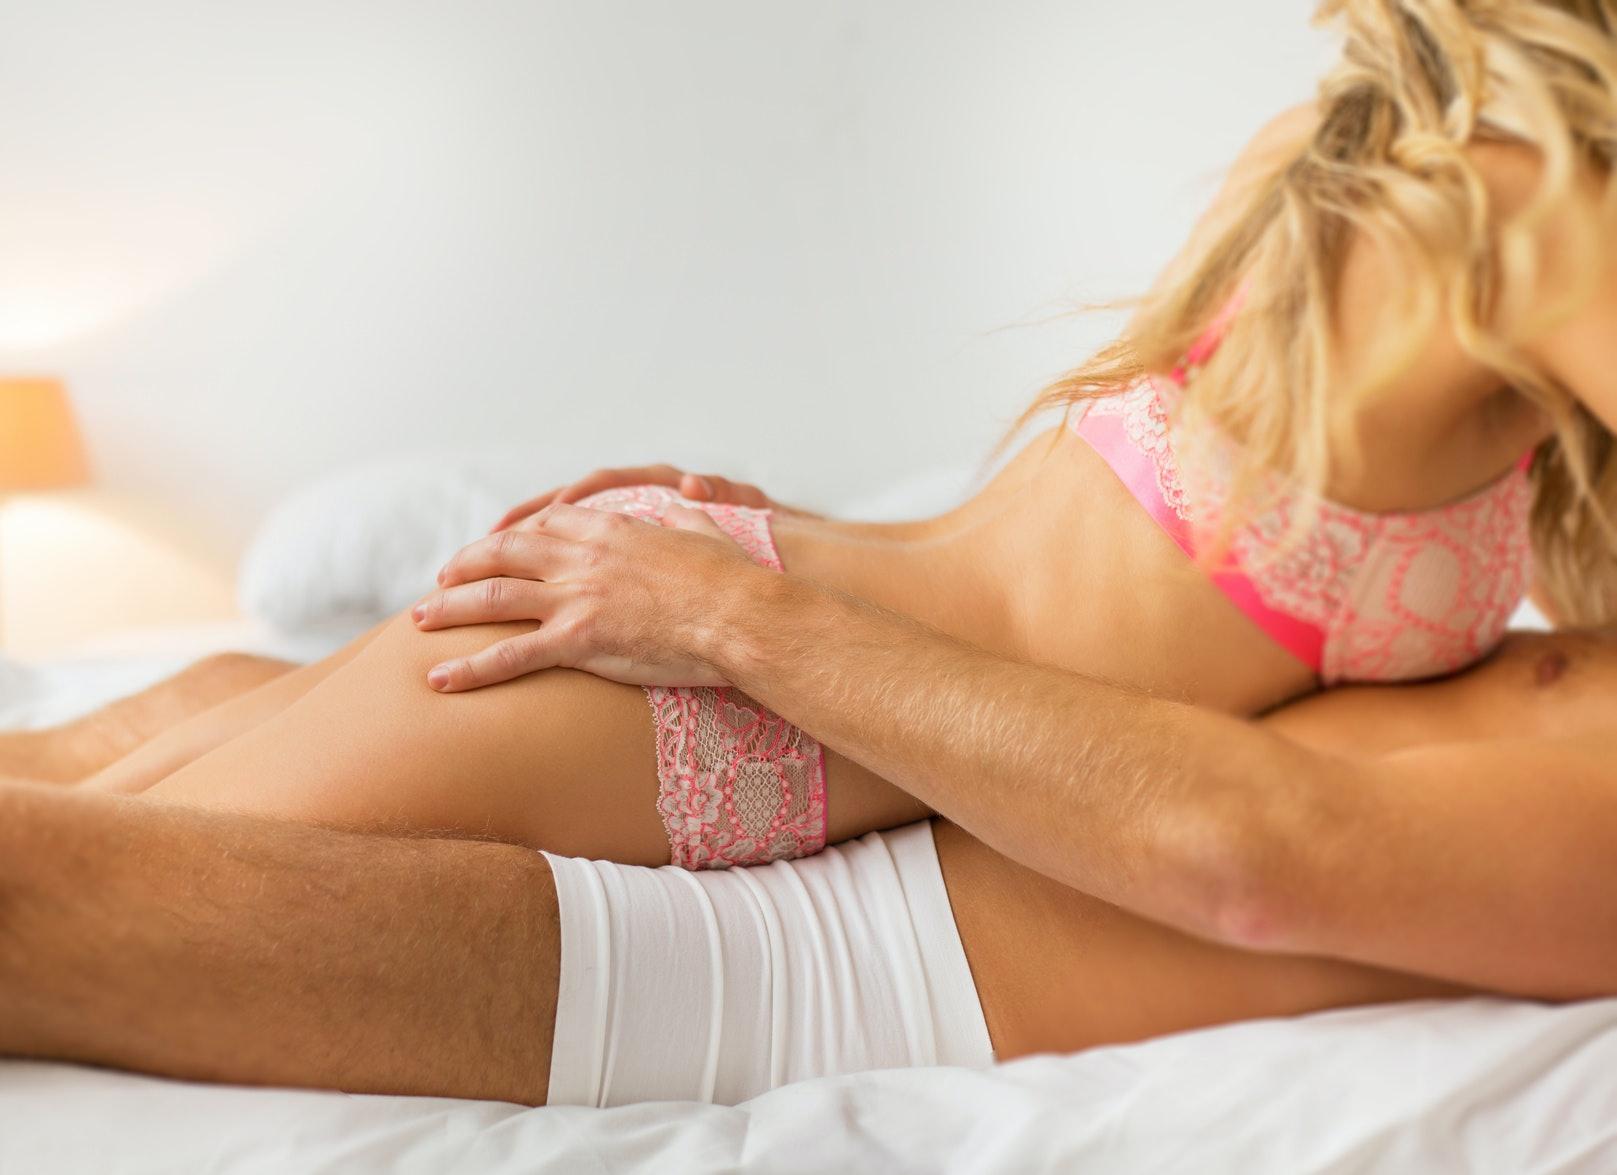 Full nude neighbor girl